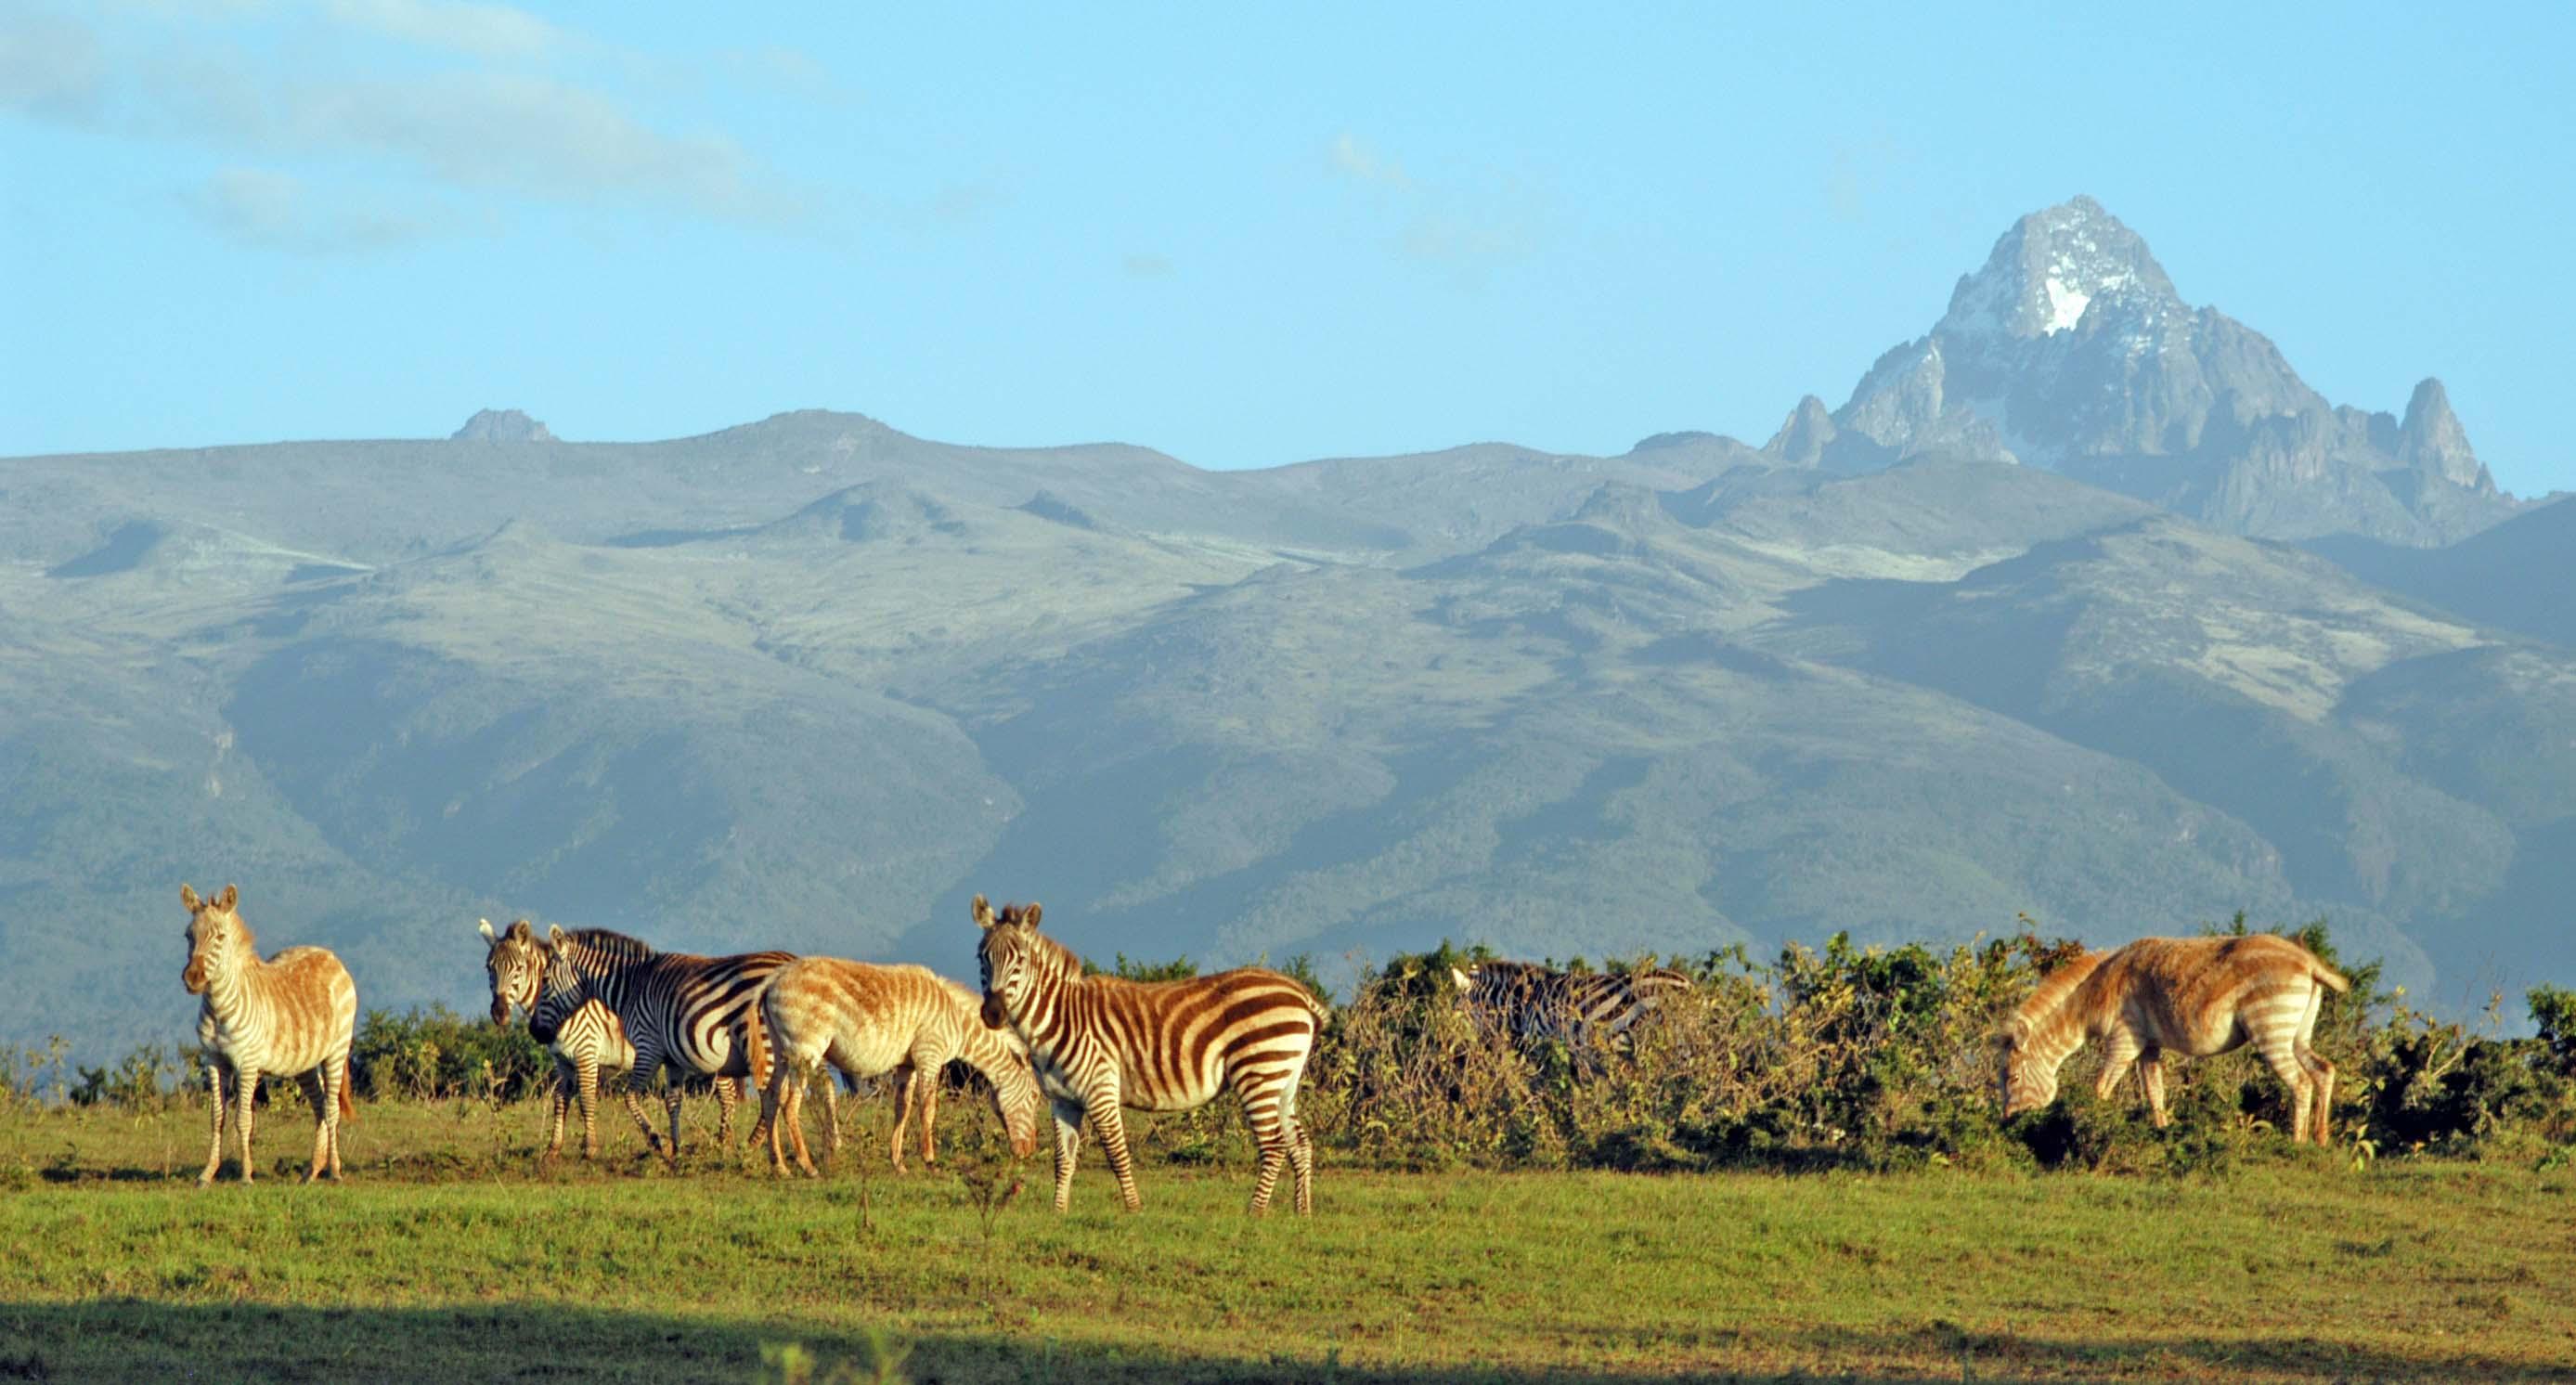 Tour Hà Nội- Nairobi-Aberdares- Nakuru-Masai Mara